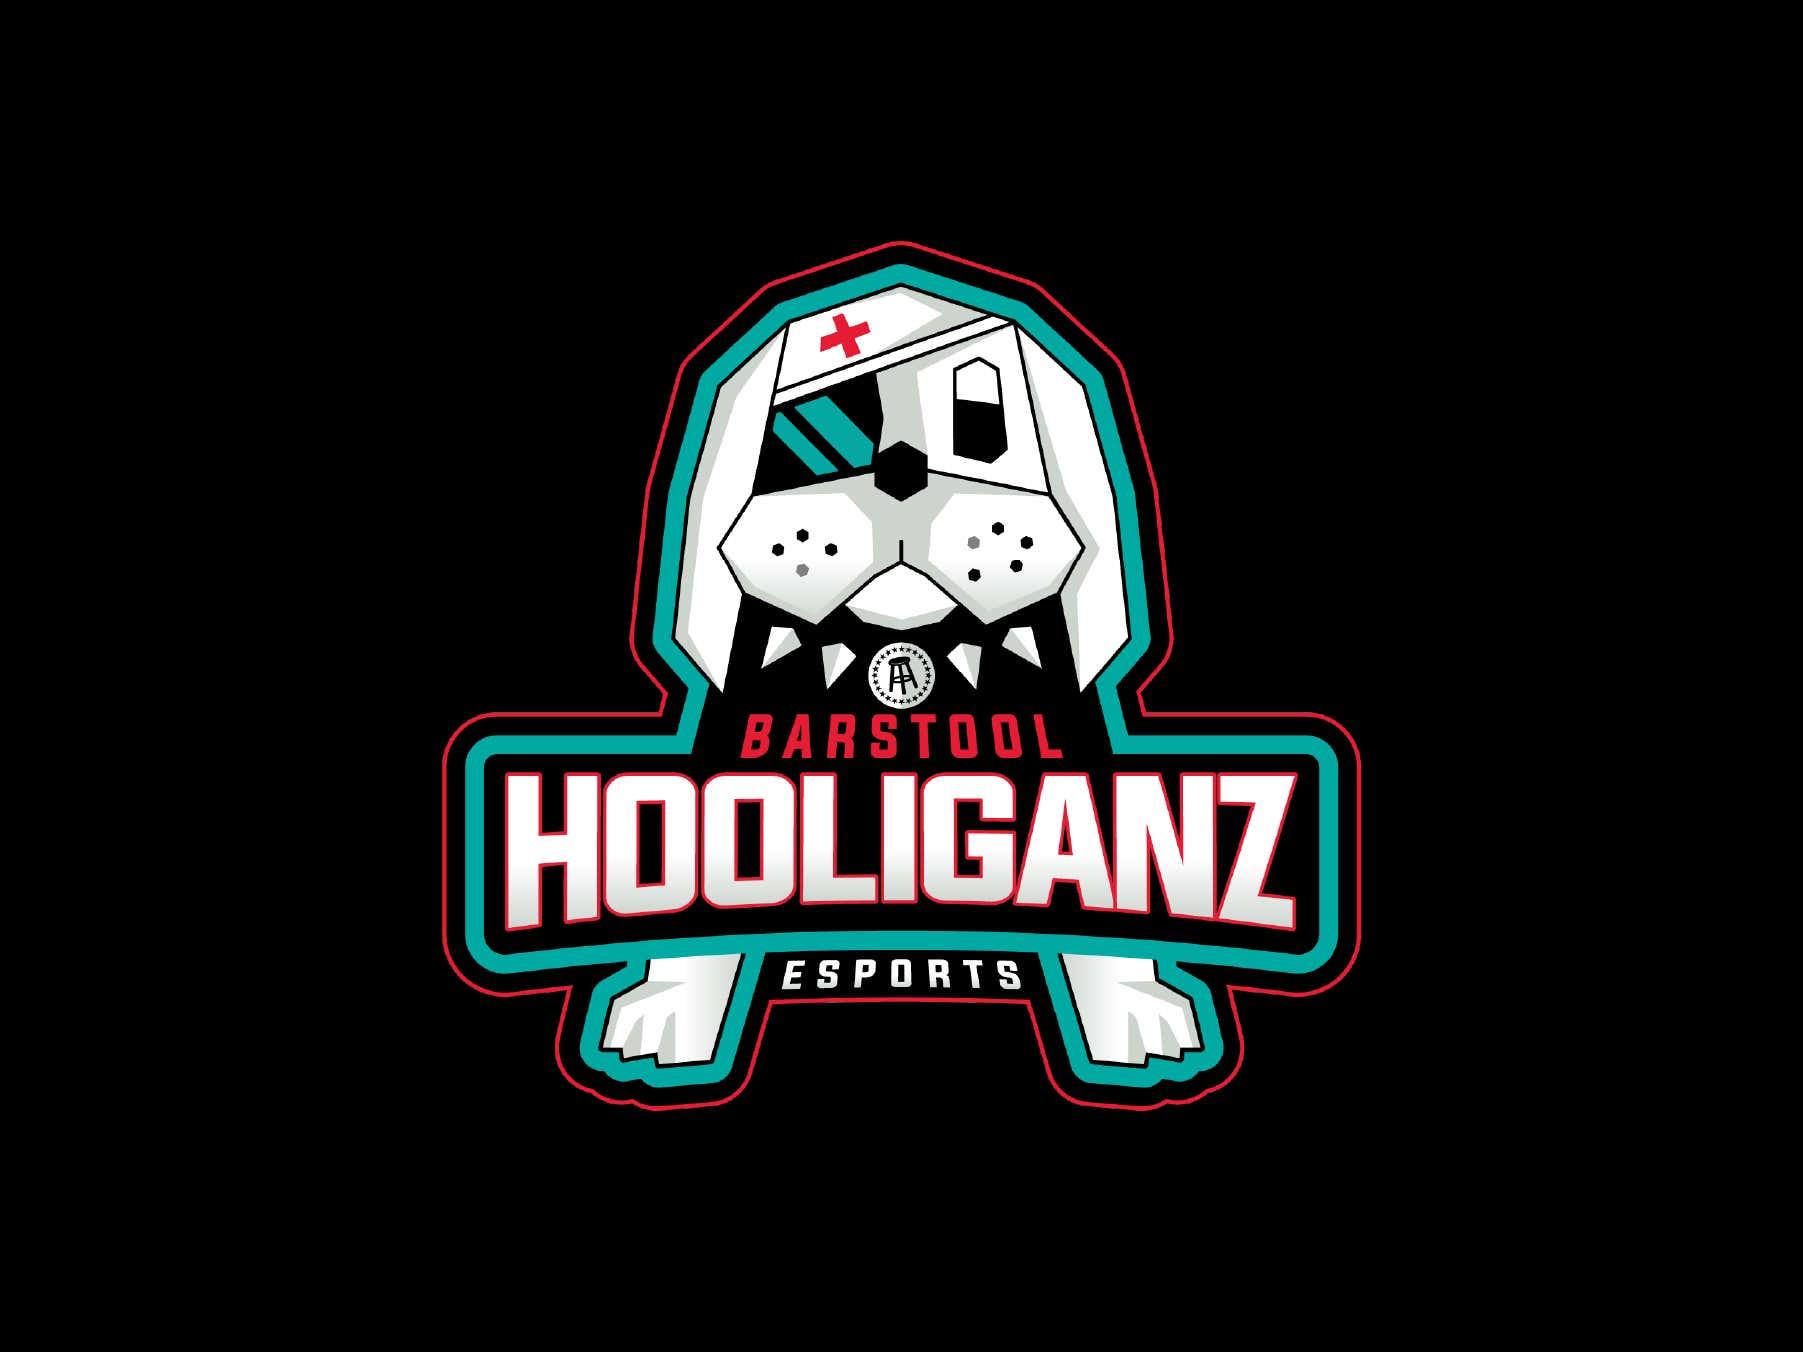 Barstool HooliganZ